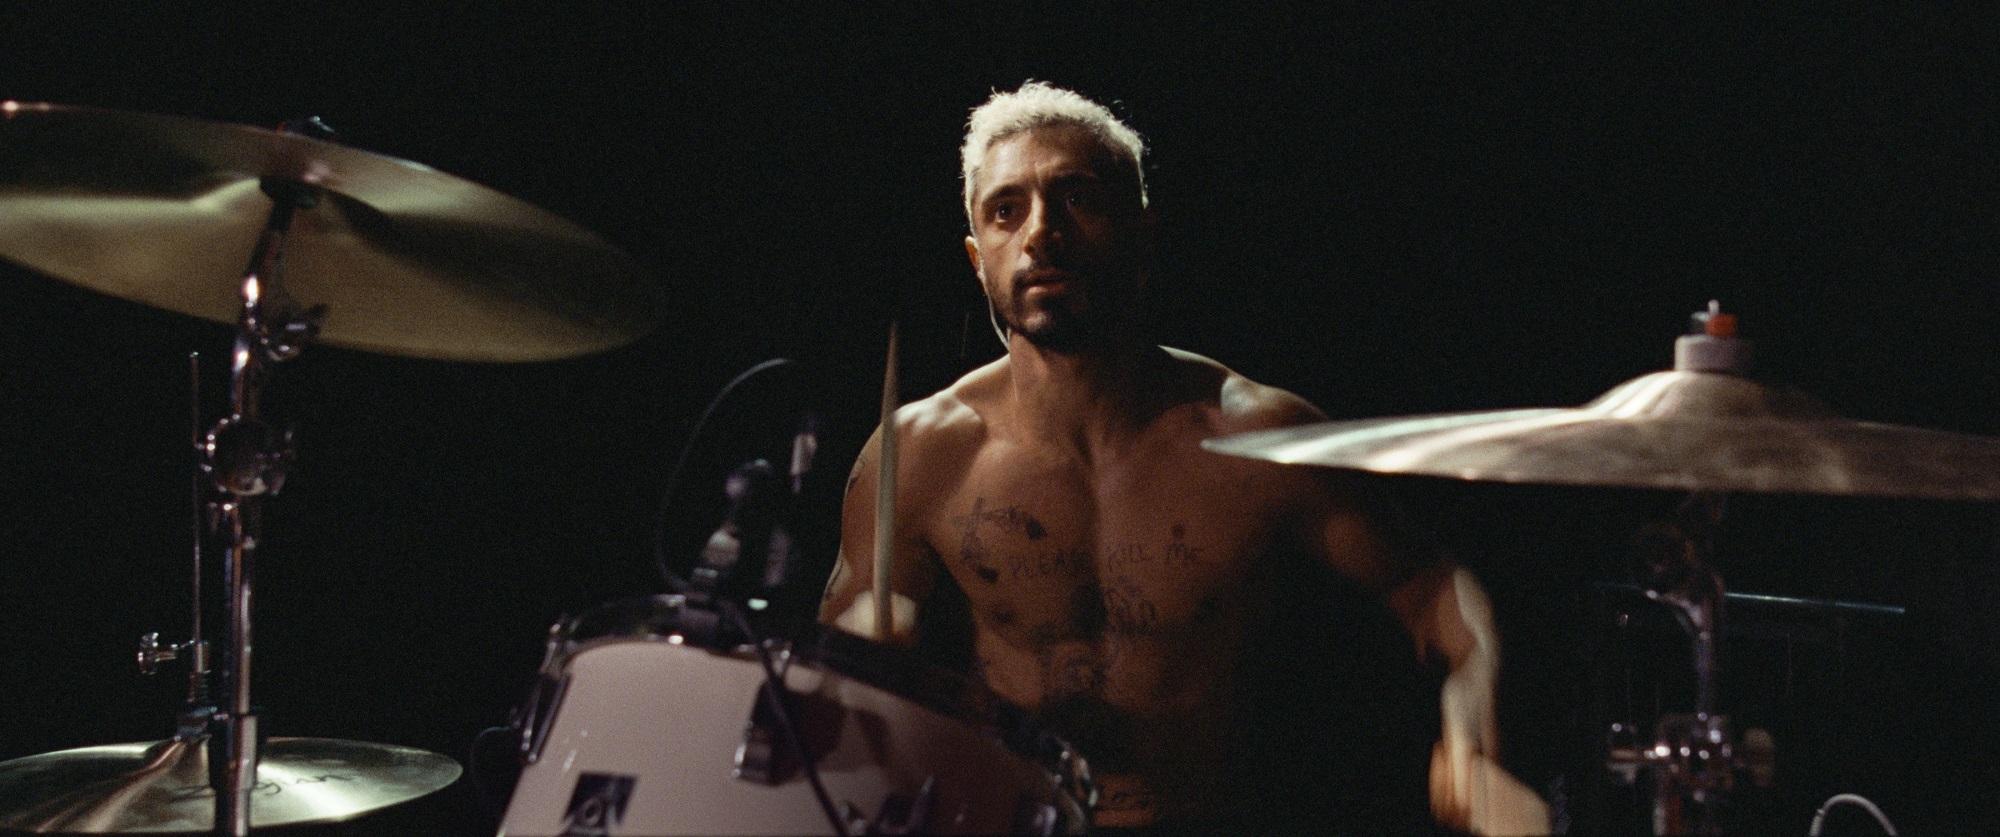 Riz Ahmen playing drums